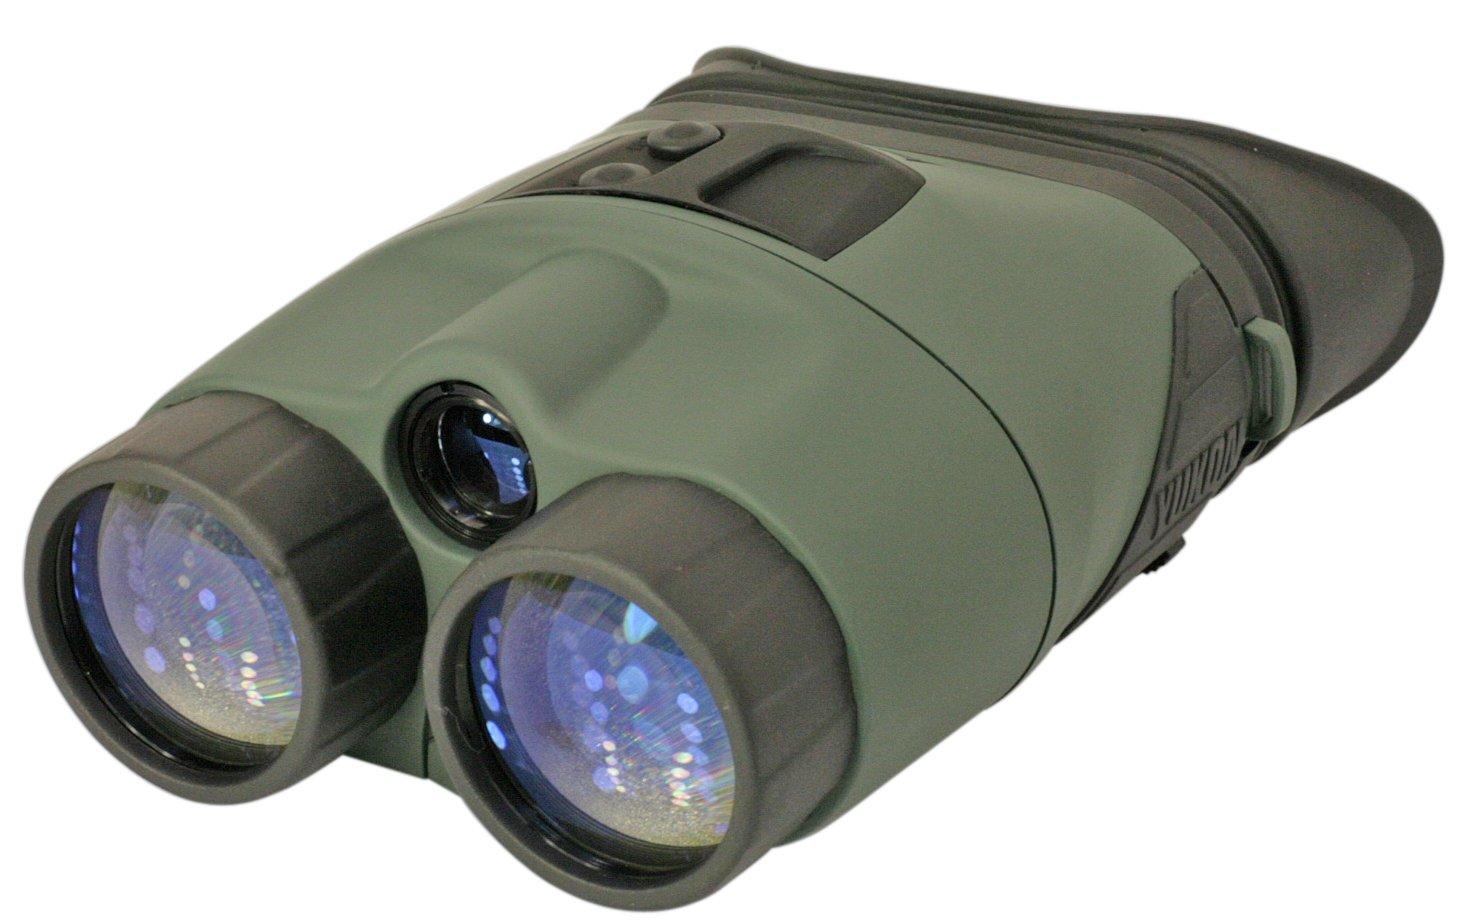 Yukon Tracker 3x42 Night Vision Binoculars by Yukon Advanced Optics